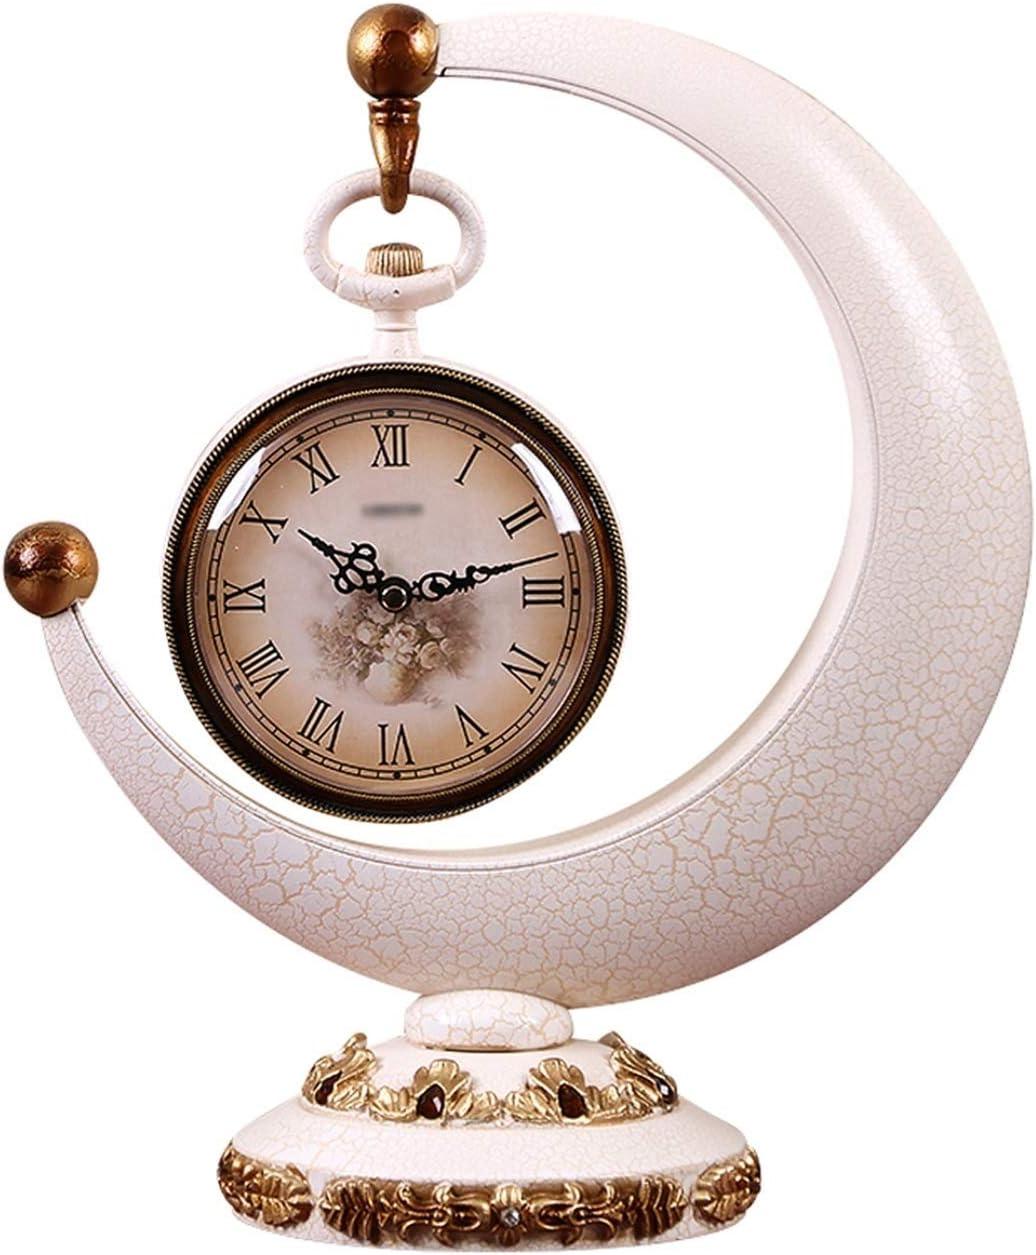 liushop Bedroom 25% OFF Alarm Clock Creativity 2021new shipping free Roman Numeral Cl Tabletop